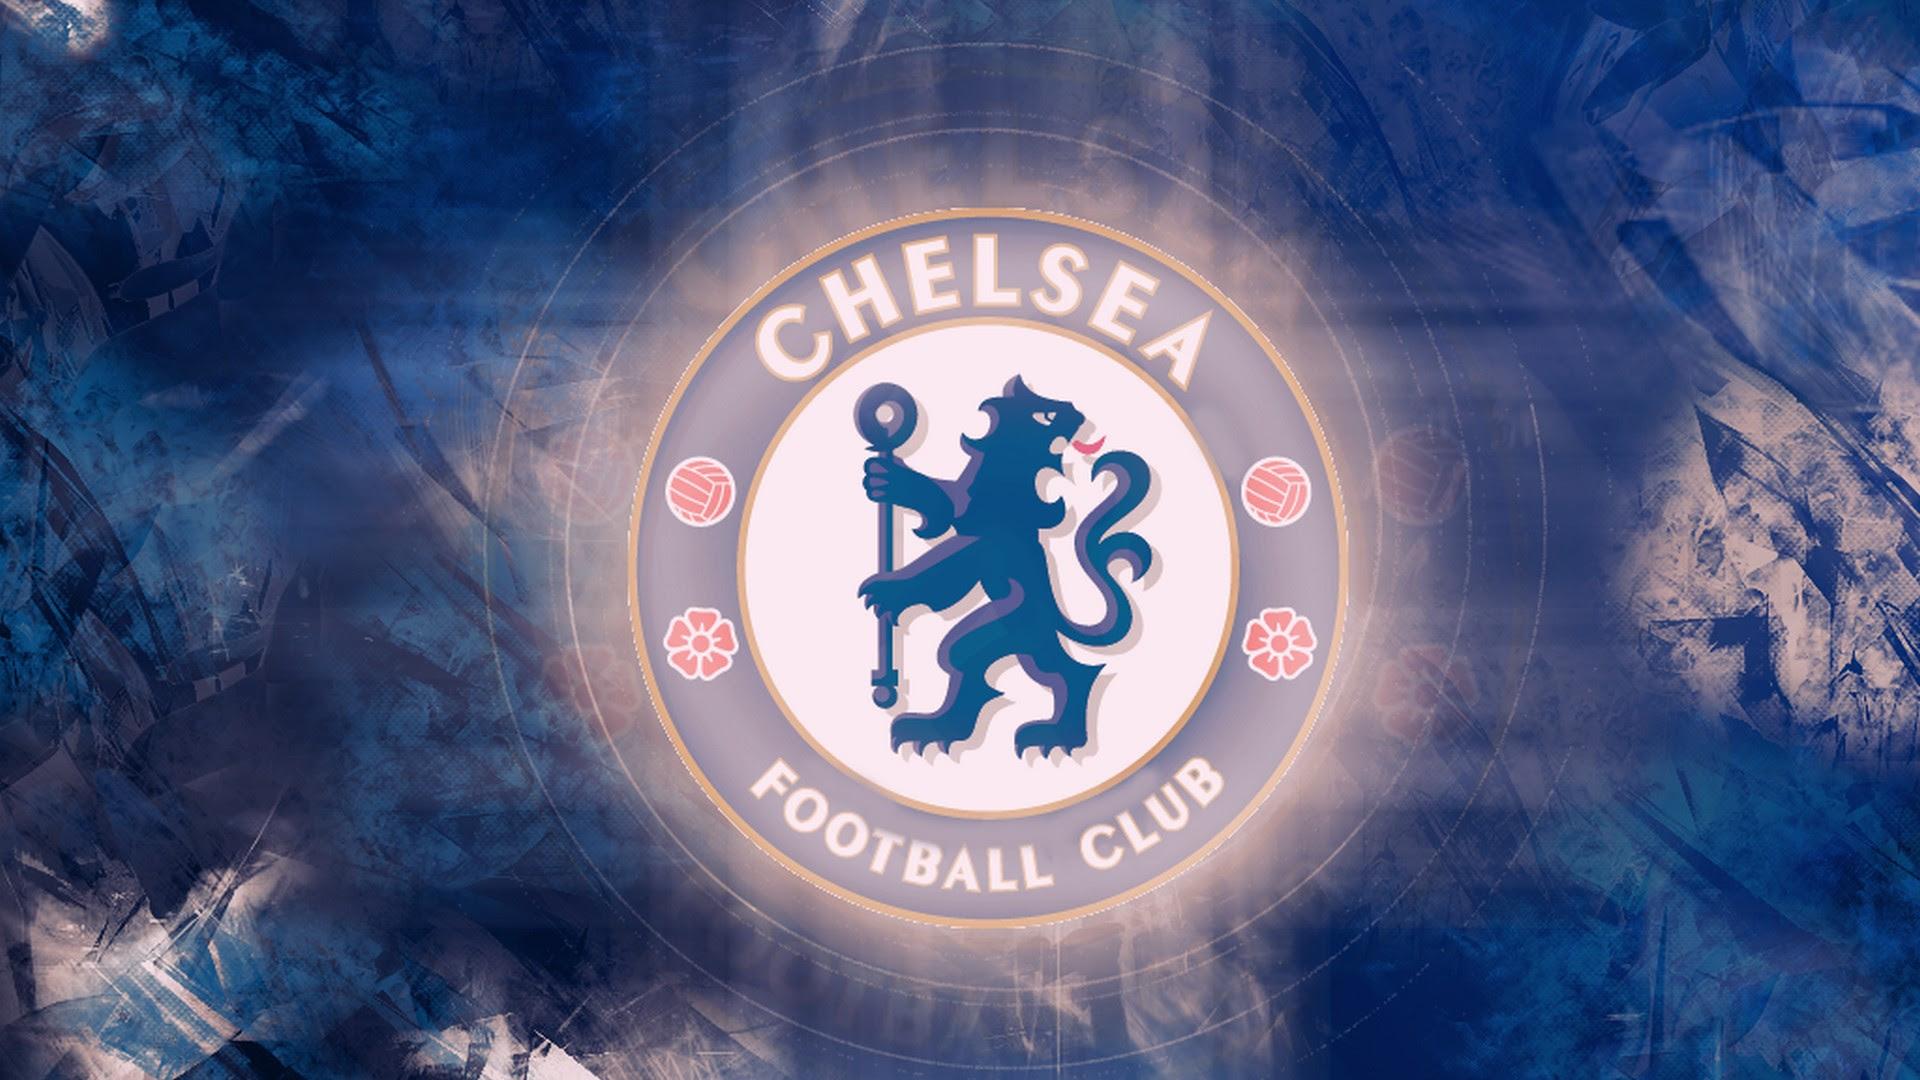 Chelsea Soccer HD Wallpapers | 2019 Football Wallpaper